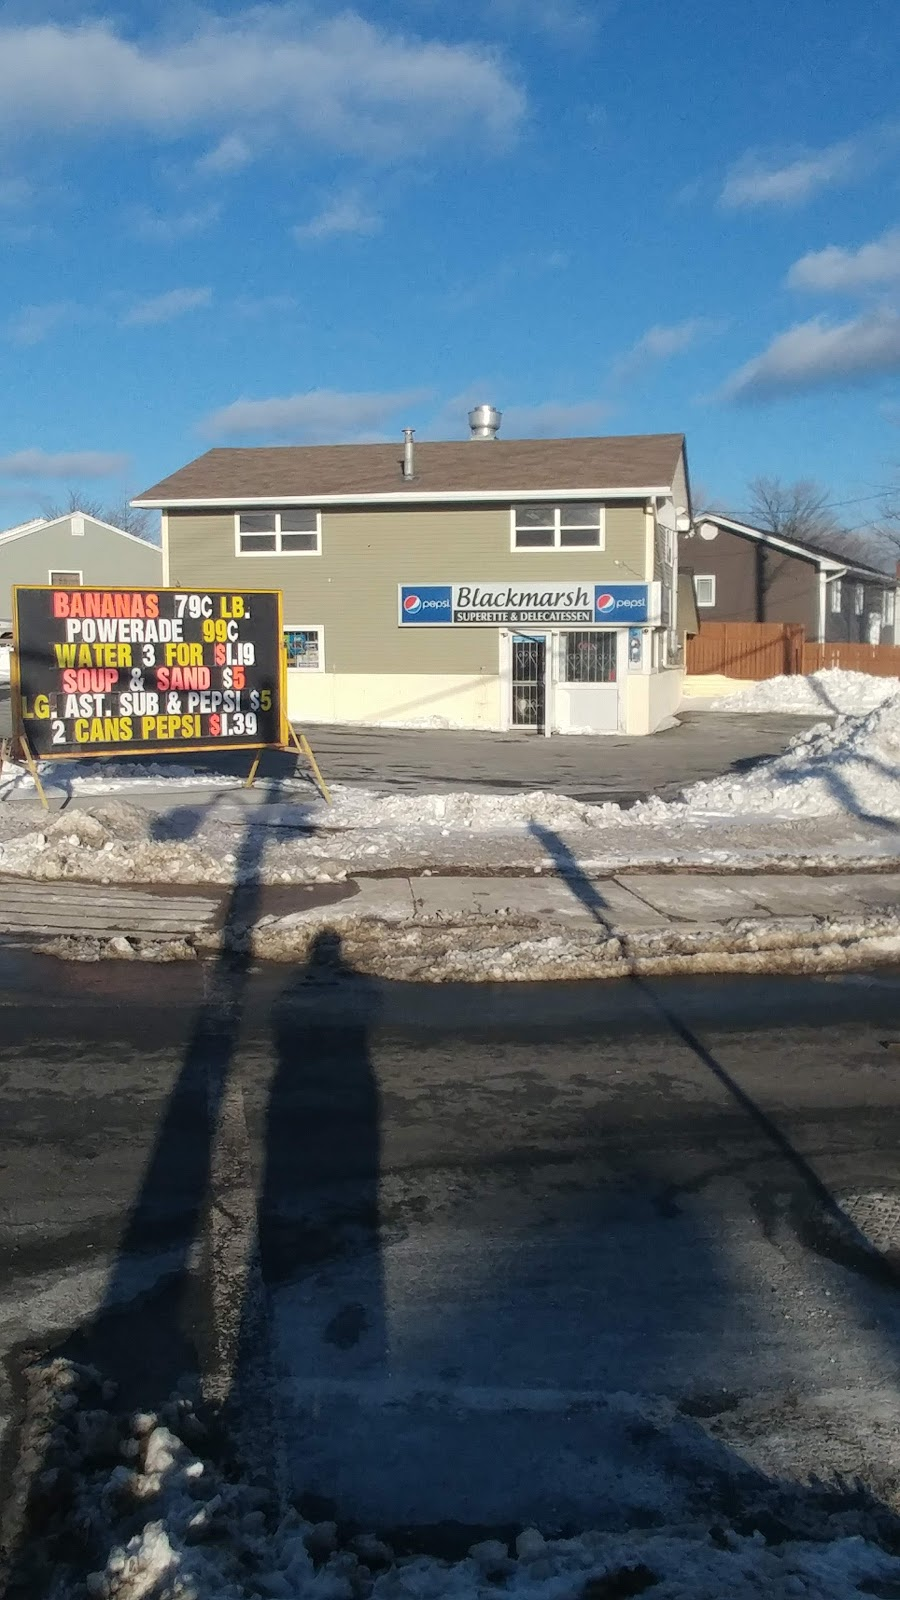 Blackmarsh Superette & Deli | convenience store | 137 Blackmarsh Rd, St. Johns, NL A1E 1S9, Canada | 7097398537 OR +1 709-739-8537